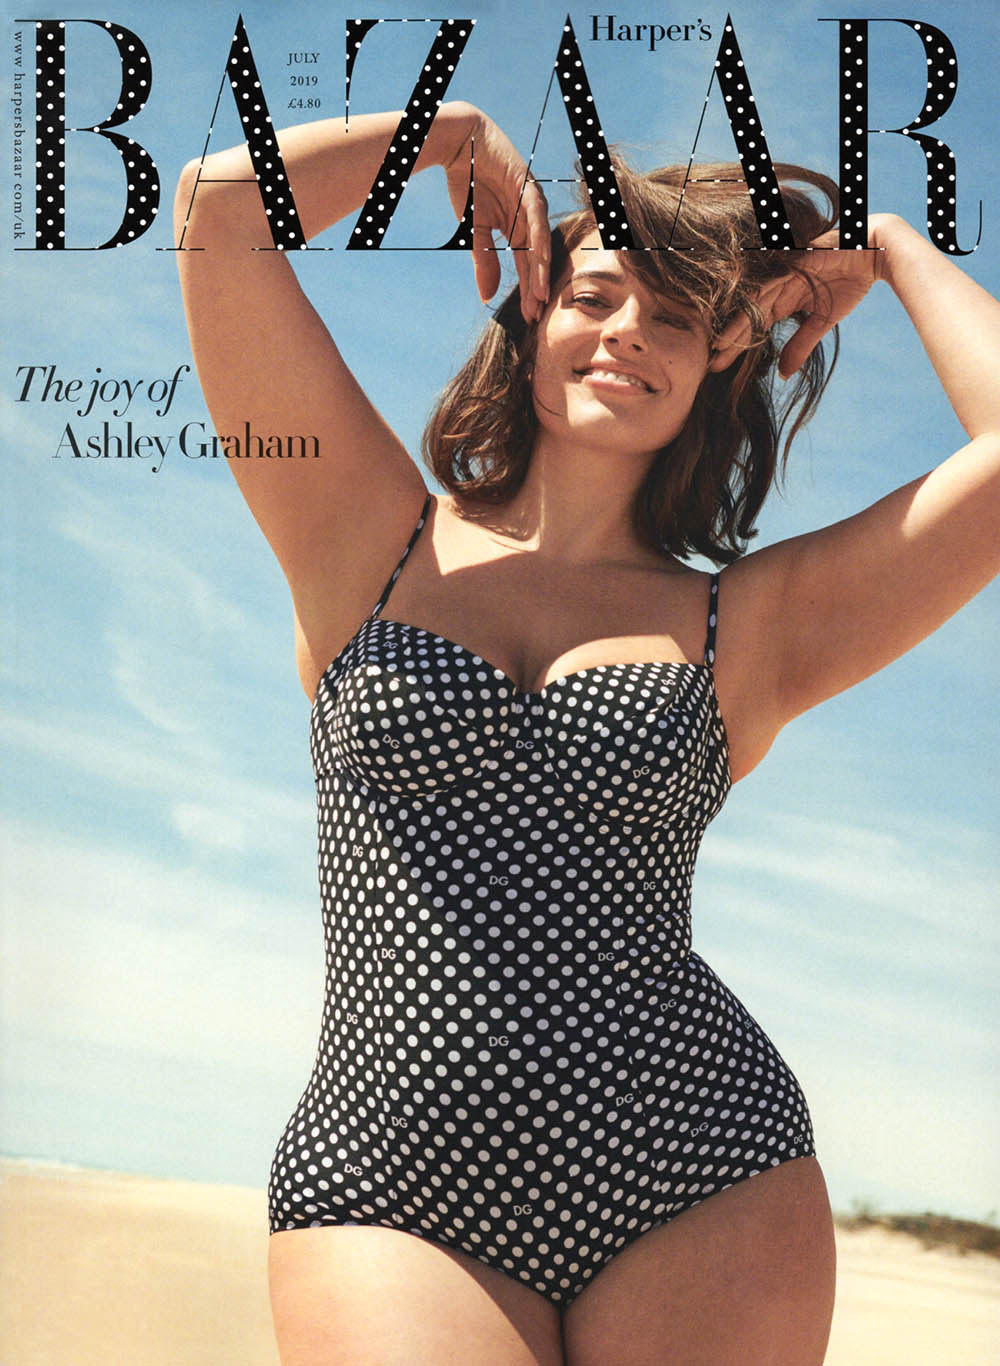 Ashley Graham covers Harper's Bazaar UK July 2019 by Pamela Hanson